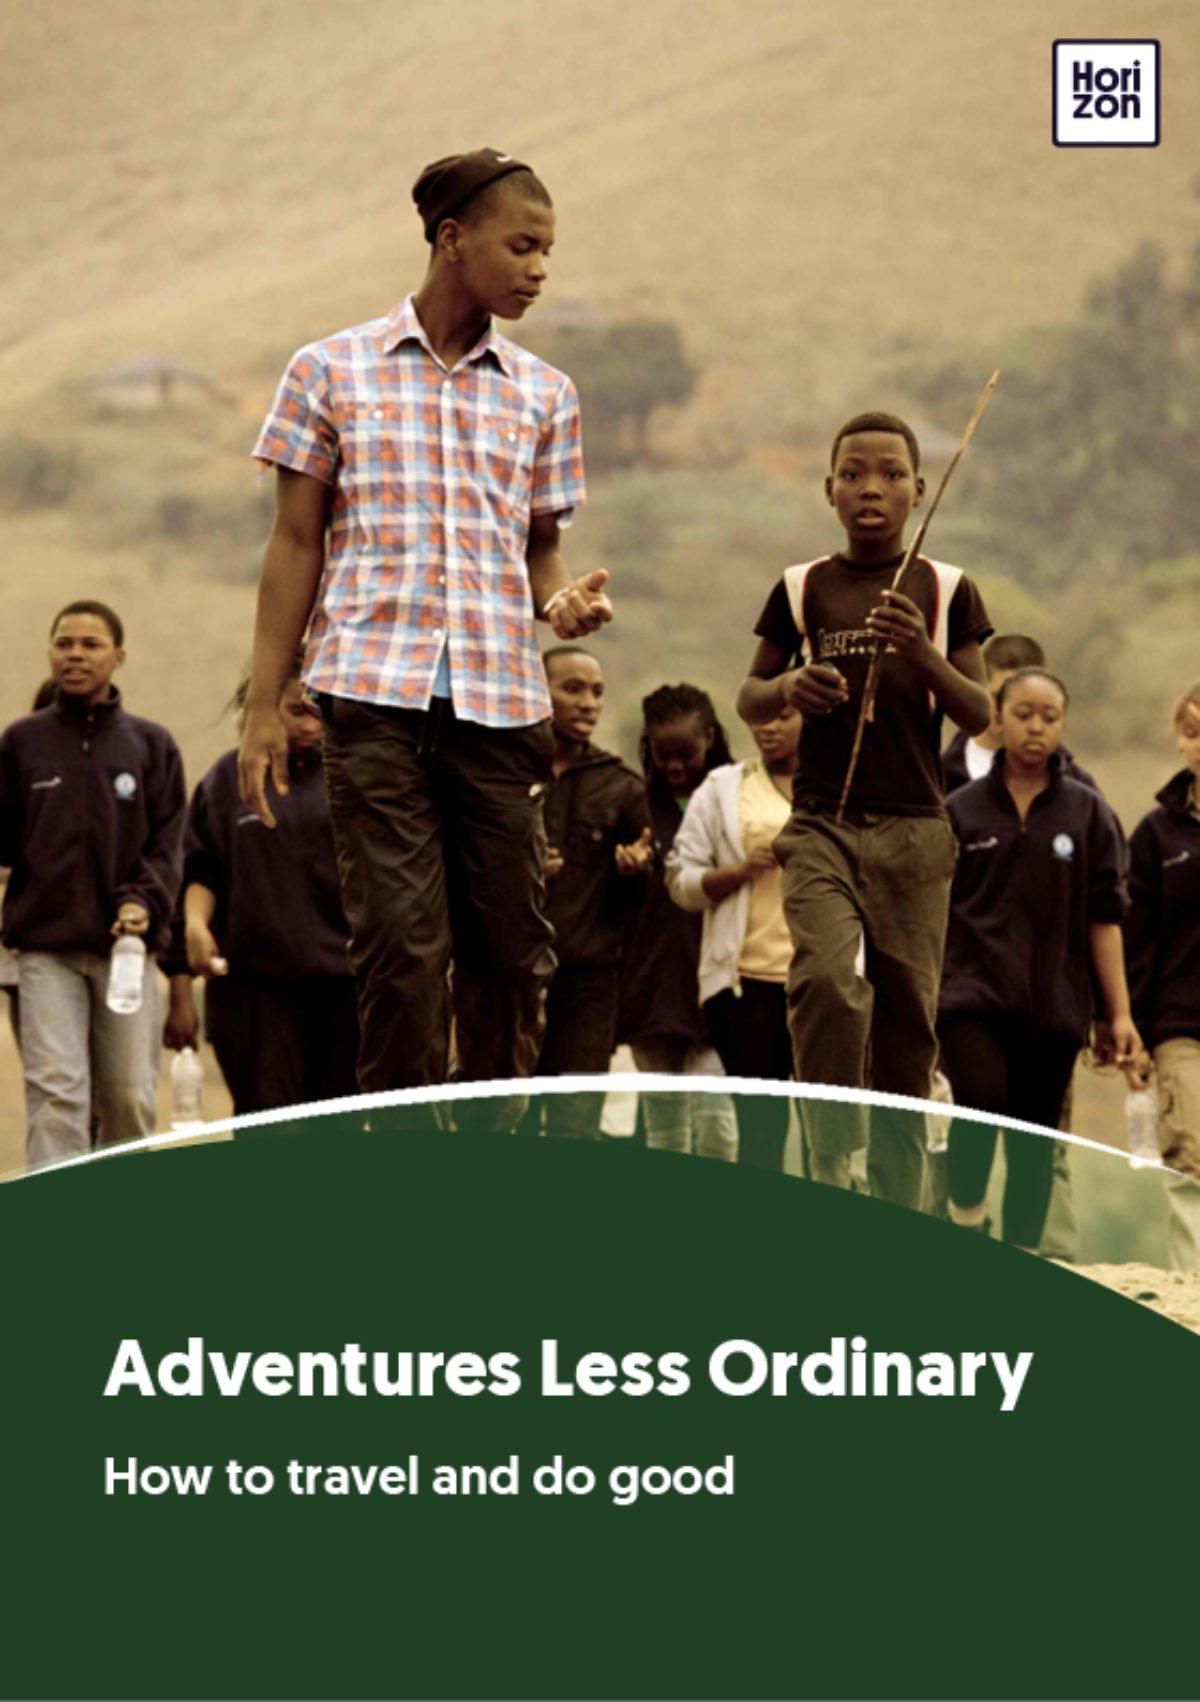 Adventures Less Ordinary